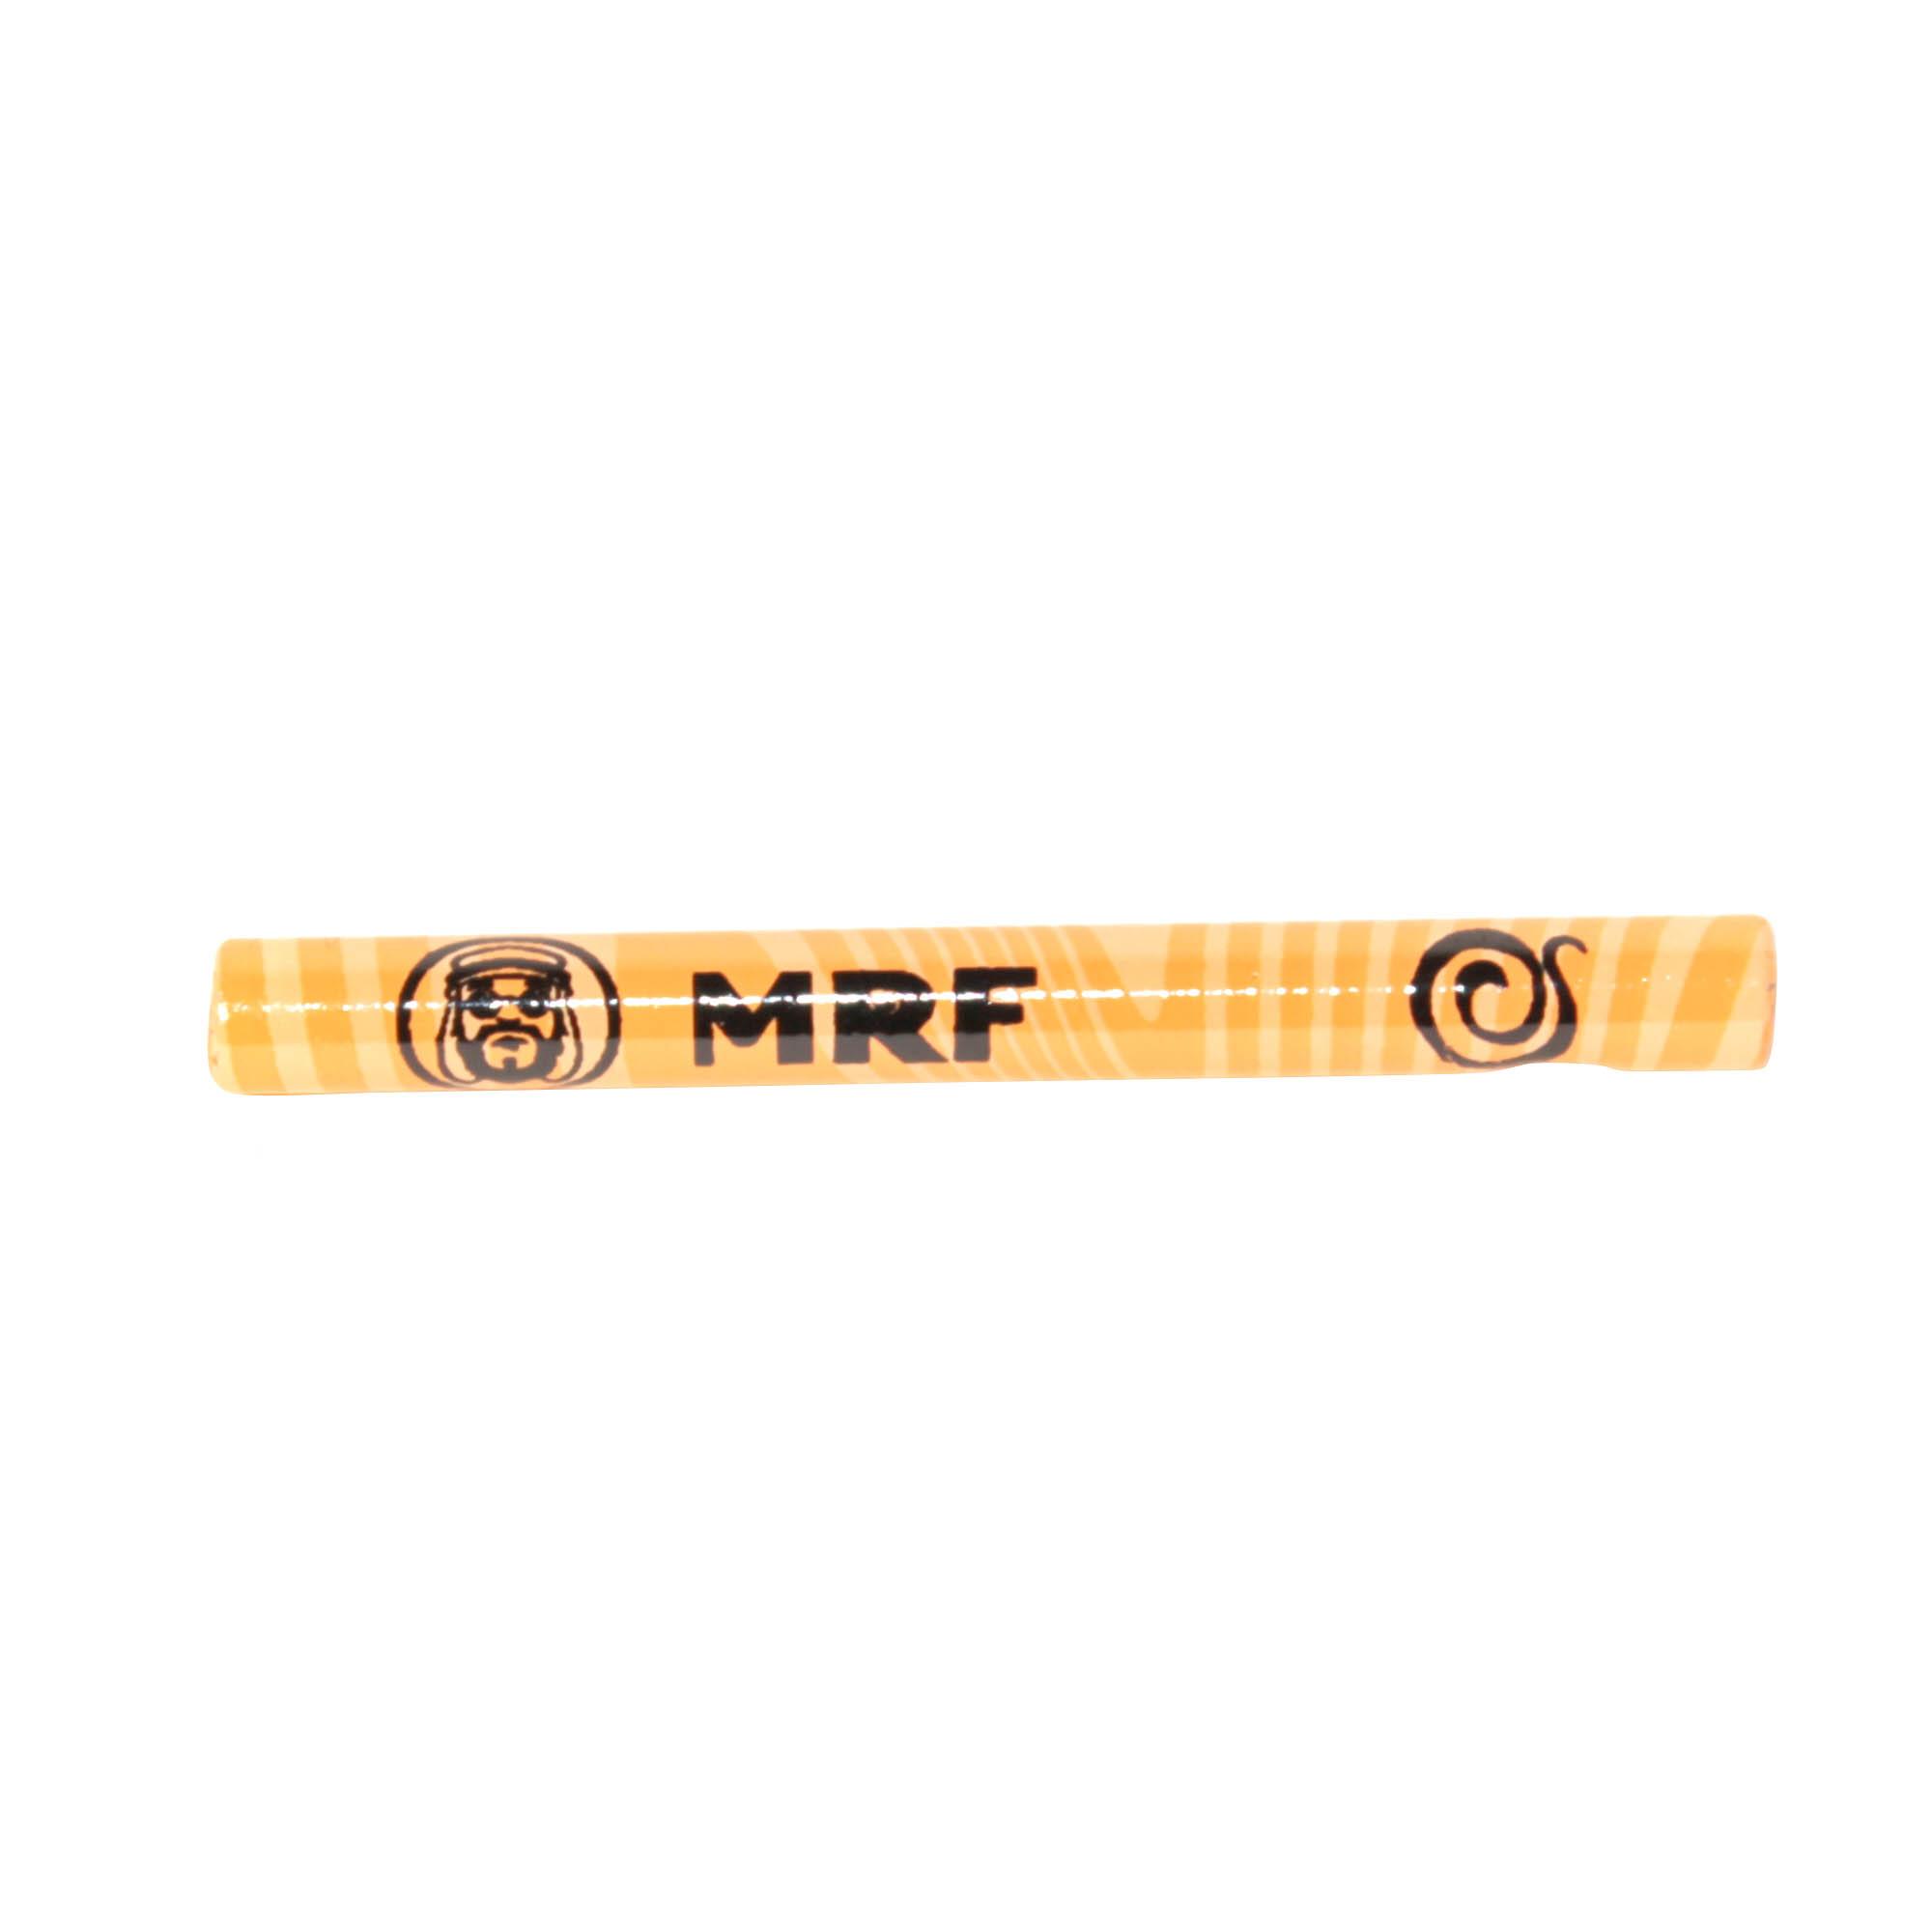 Piteira de Vidro MRF Elements Classic - Ar (6 mm)  - Mr. Fumo